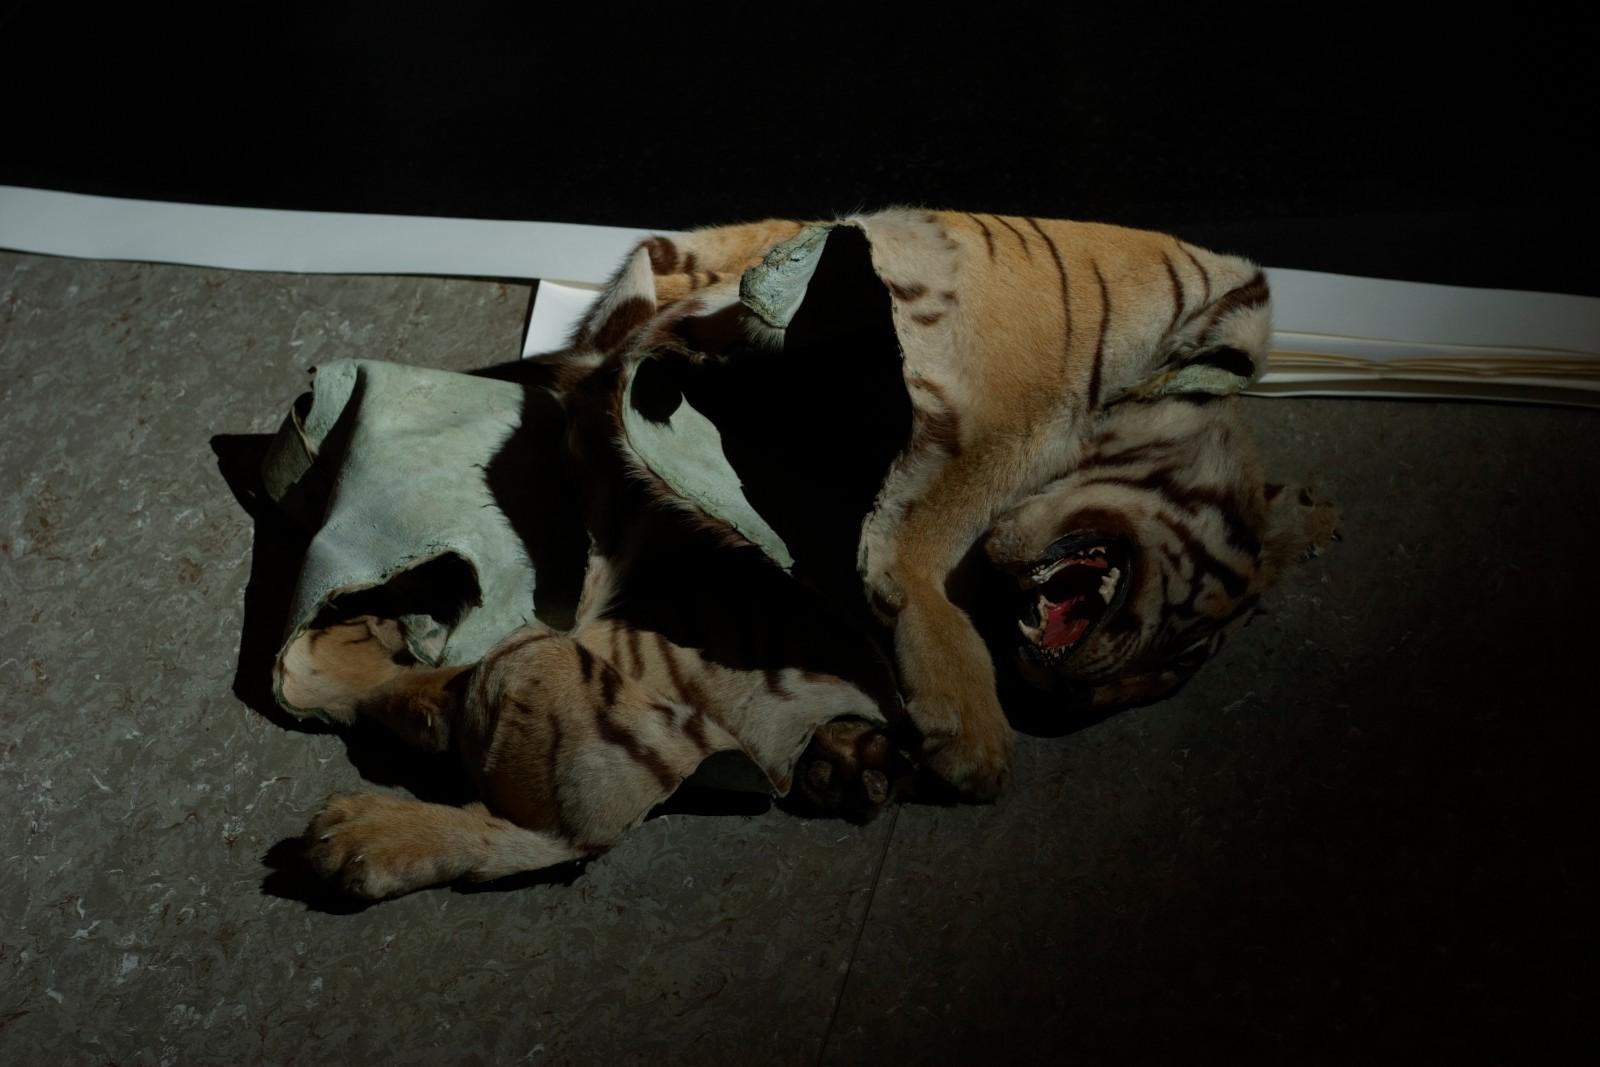 tiger, 2006, C-print, 73 x 103 cm, ed. 5